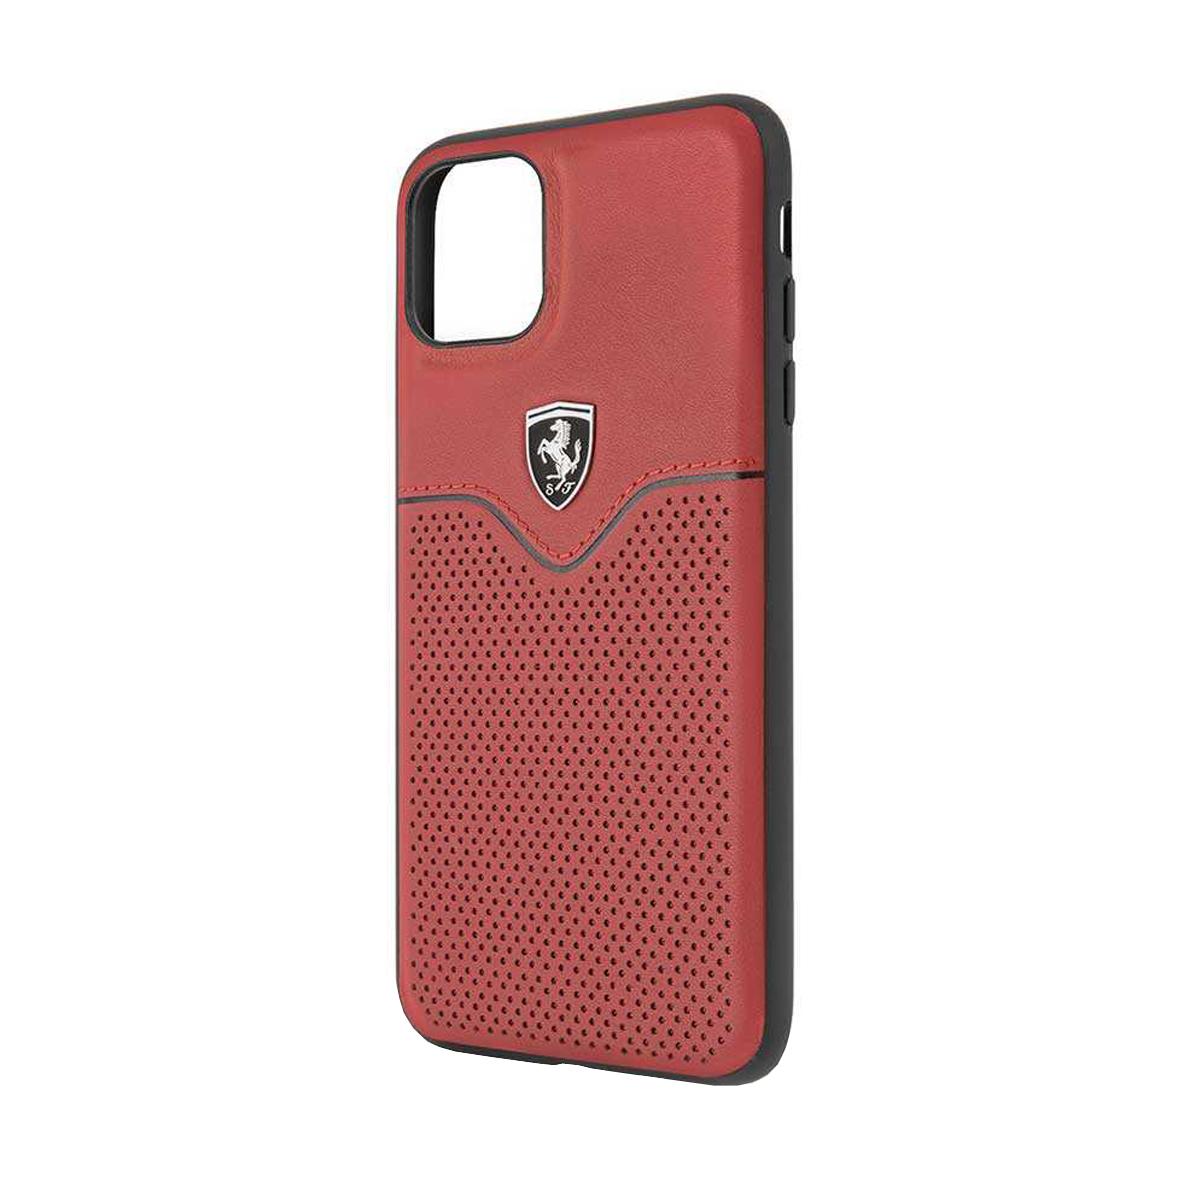 کاور   سی جی موبایل کد 22322 مناسب برای گوشی موبایل اپل iphone 11 pro